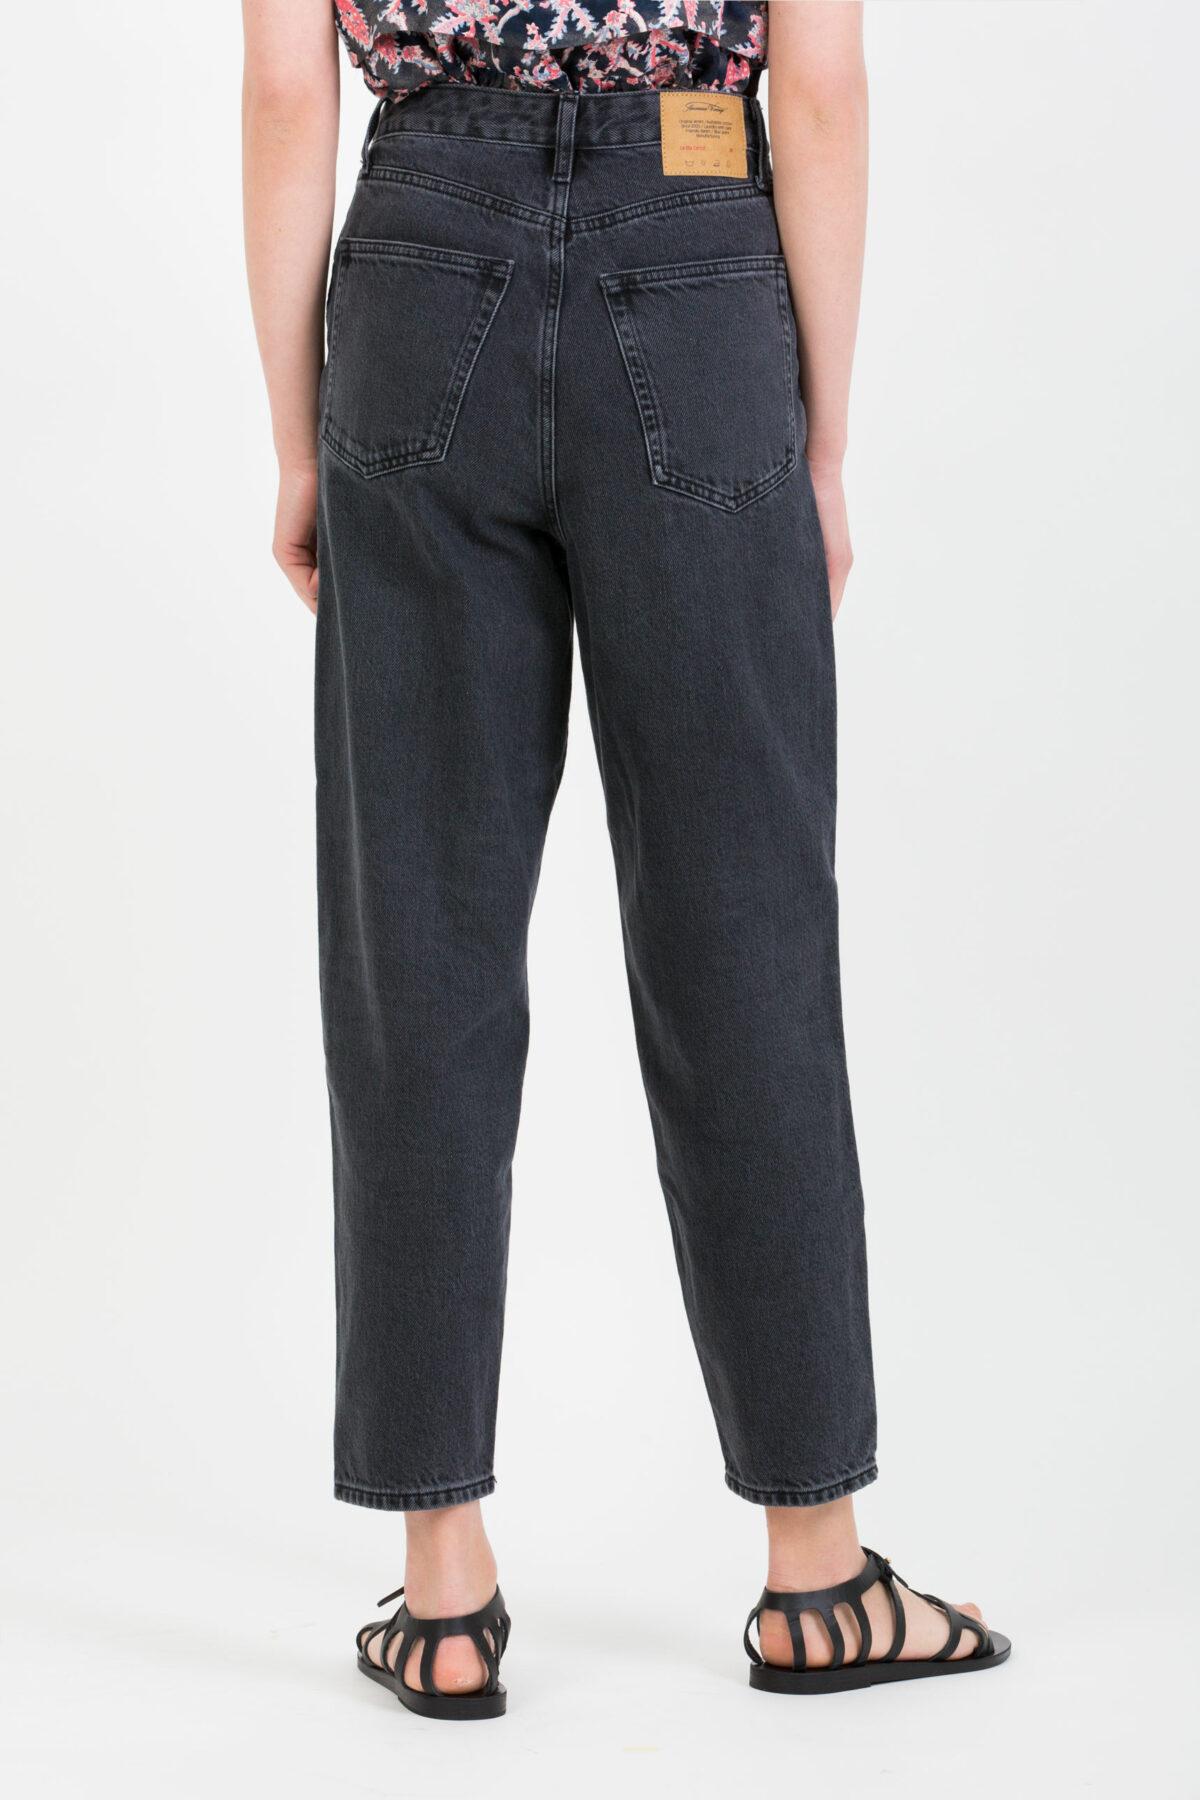 yopday-back-denim-jeans-caarrot-american-vintage-matchboxathens